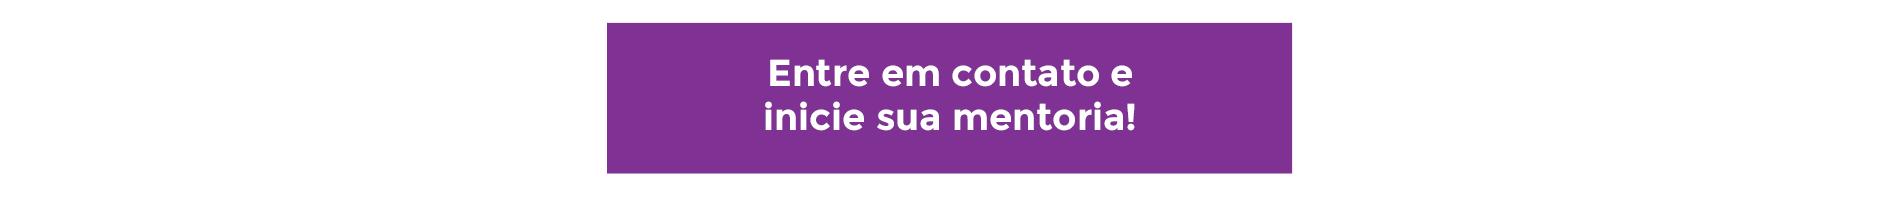 https://www.mestregp.com.br/wp-content/uploads/2020/02/botao_inscrevese_geral-1900x200.png